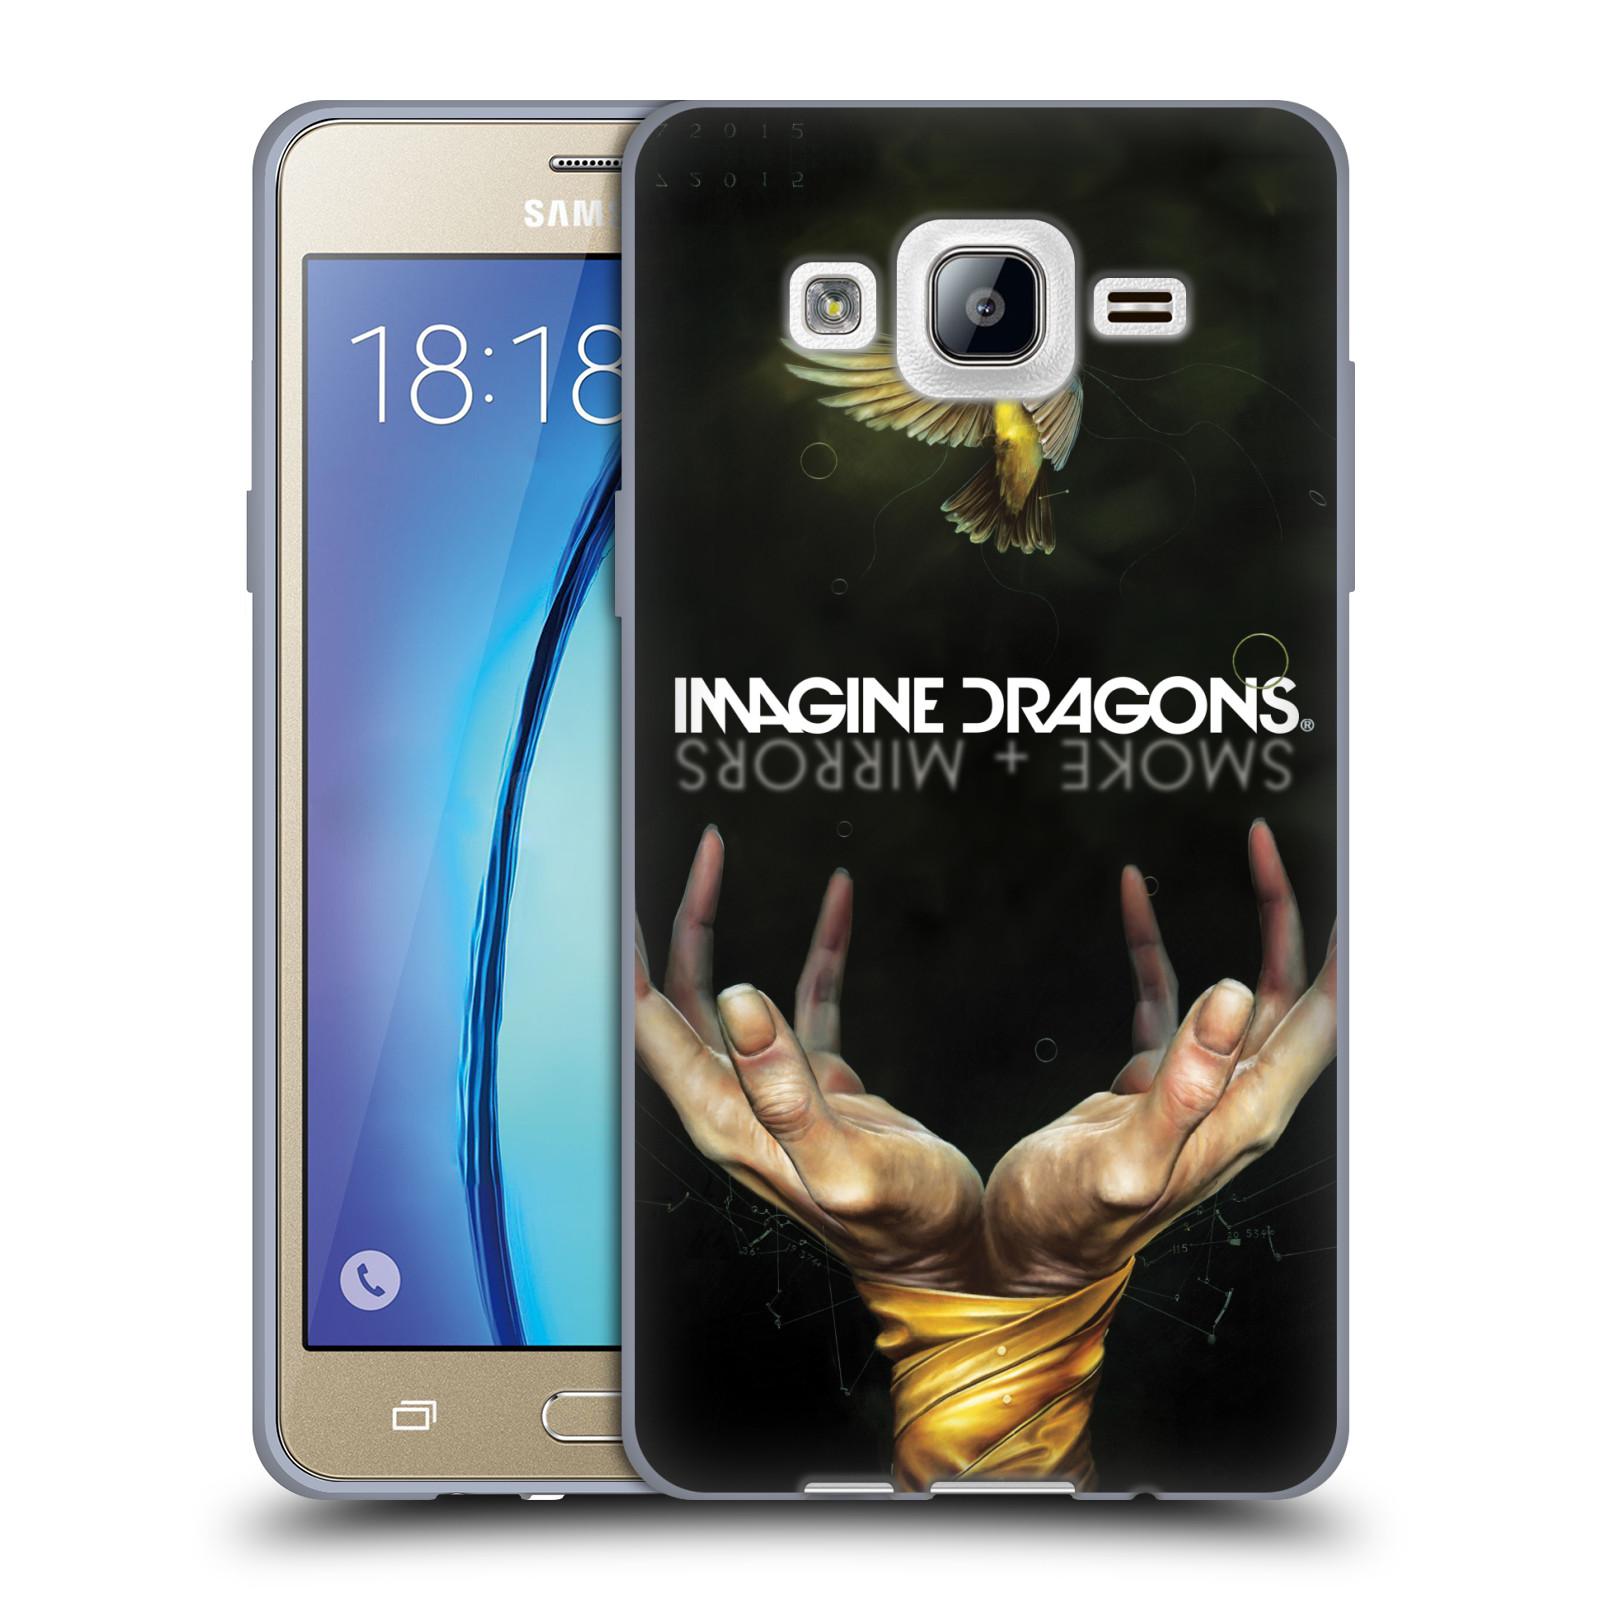 HEAD CASE silikonový obal na mobil Samsung Galaxy On5 hudební skupina Imagine Dragons SMOKE and MIRRORS